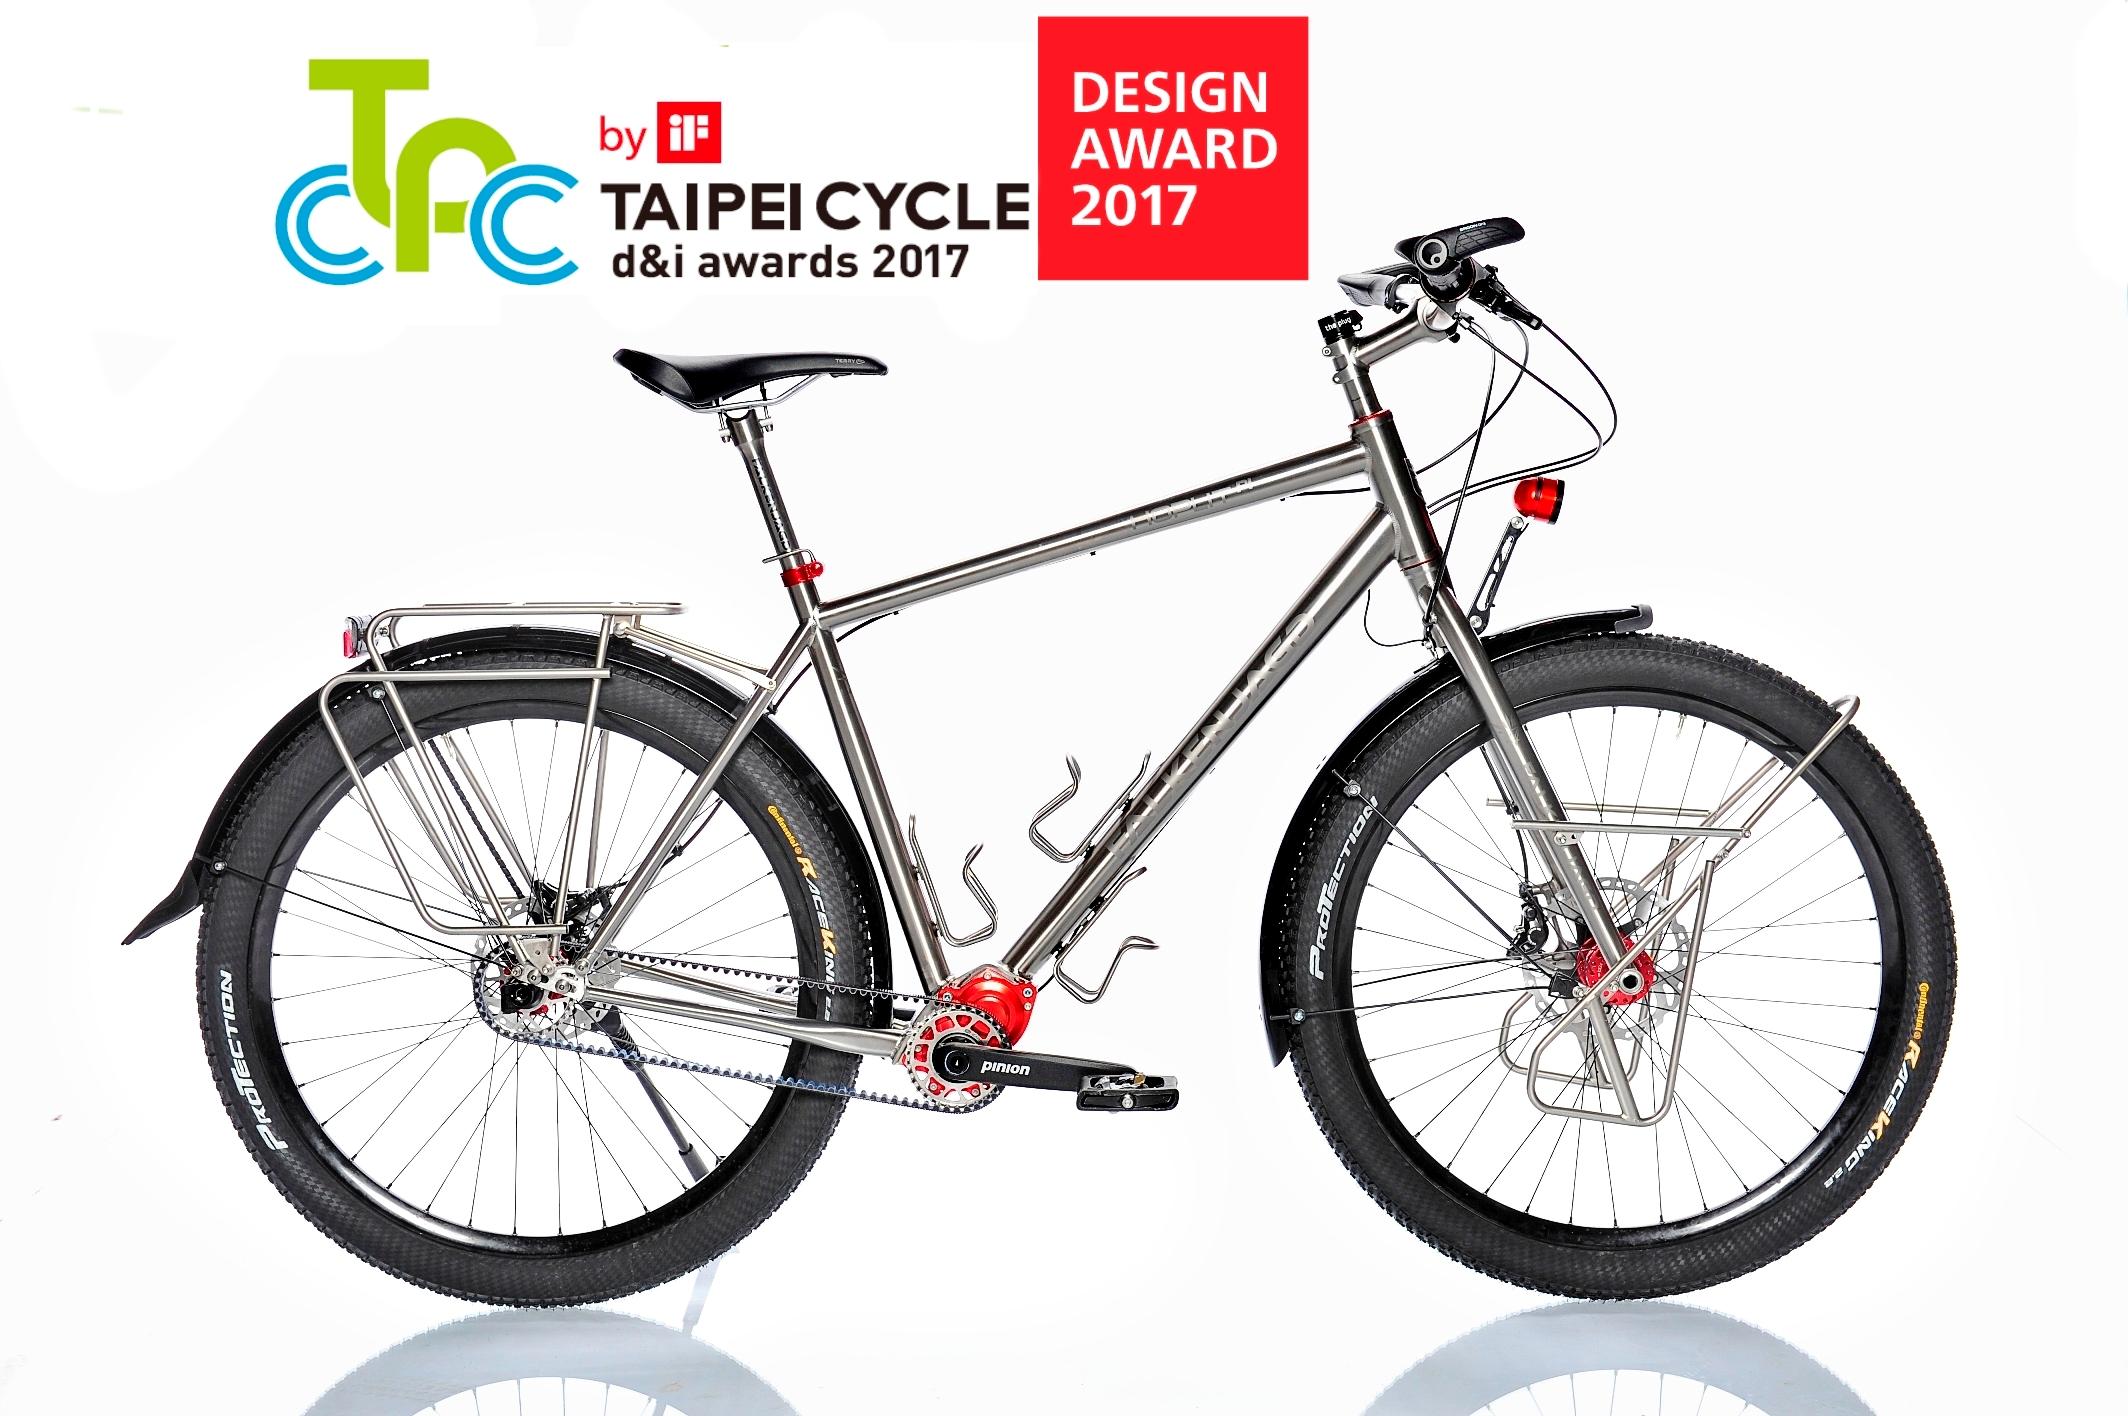 Falkenjagd_Hoplit_PI_iF_design_award_2017